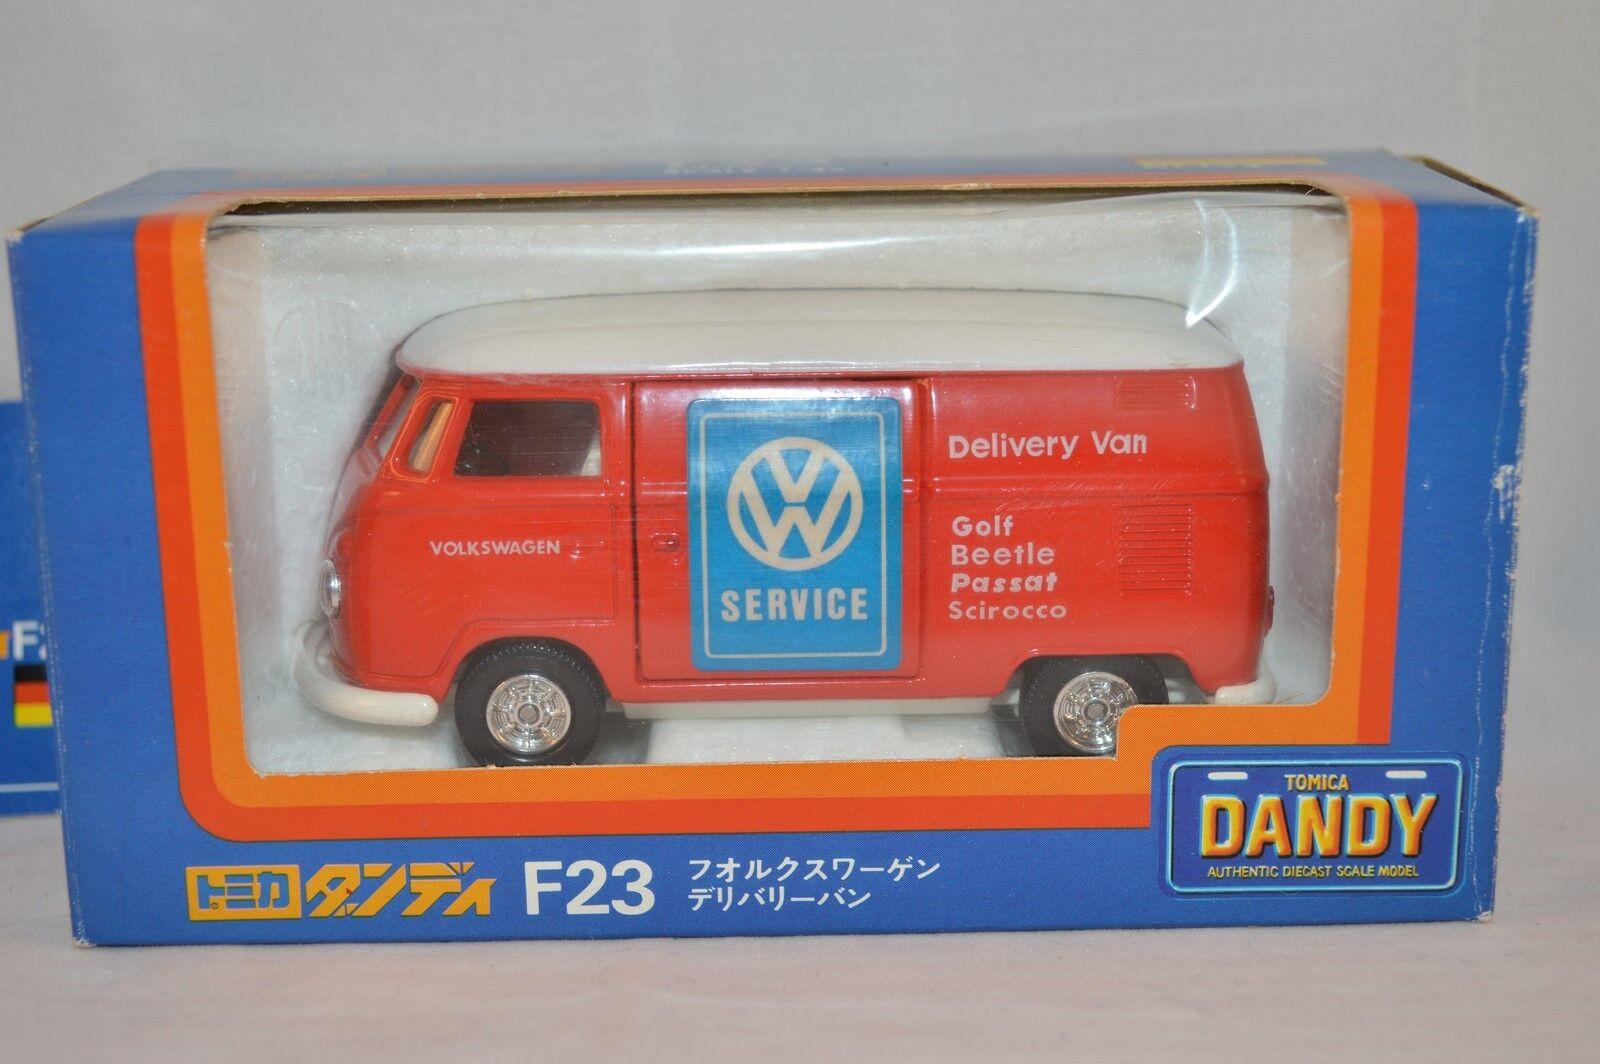 Tomica 1 43 F23 Volkswagen Bulli Van  Mint in Box.